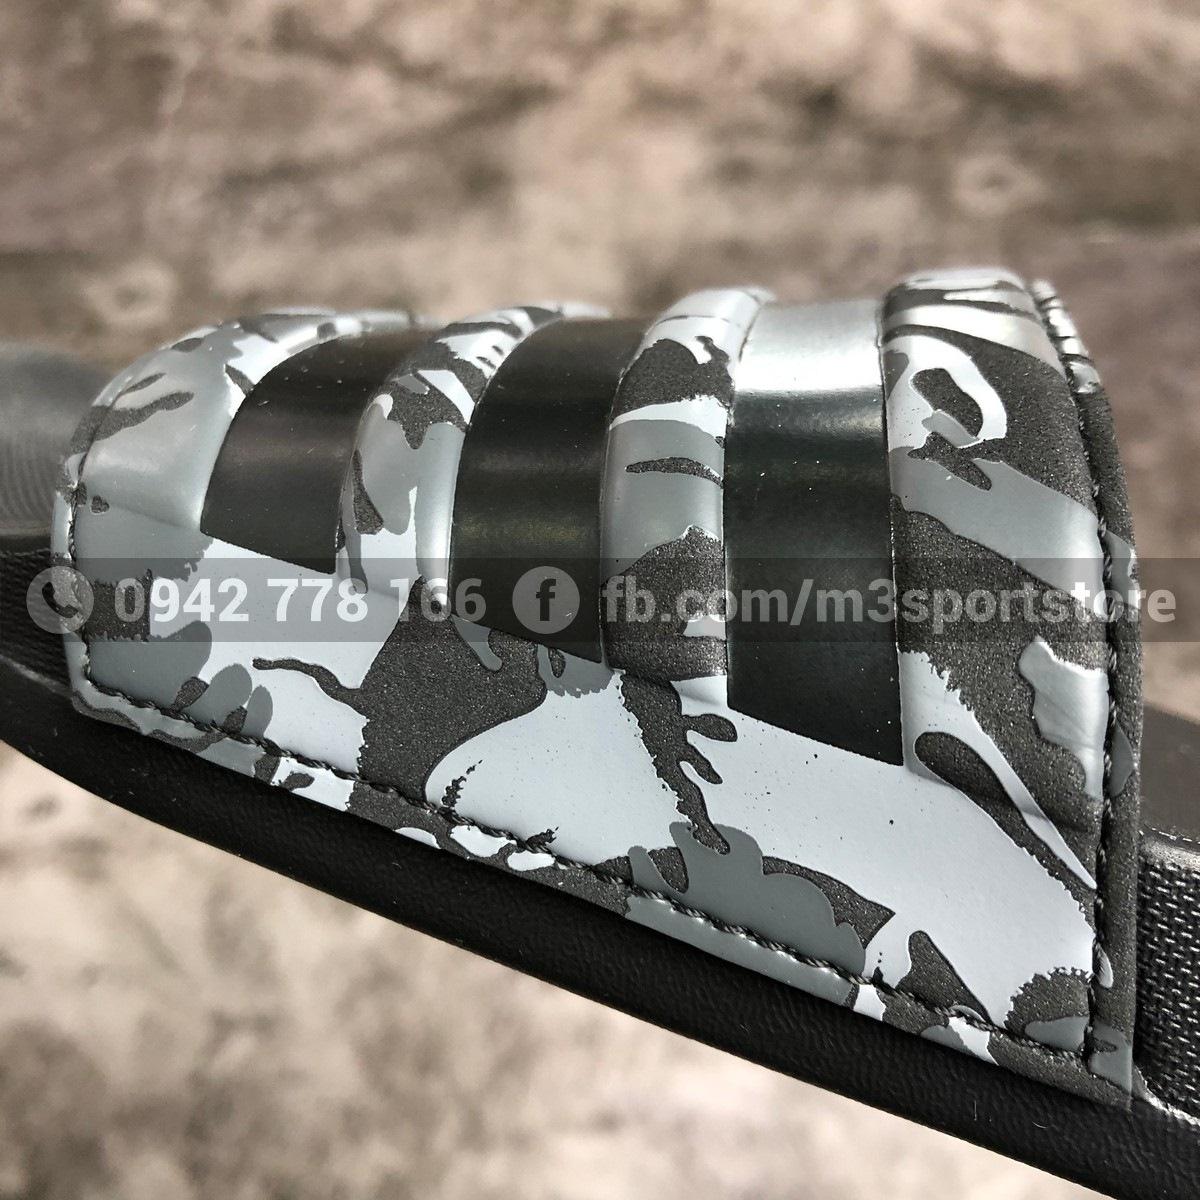 Dép thể thao nam Adidas Adilette Comfort FZ1755